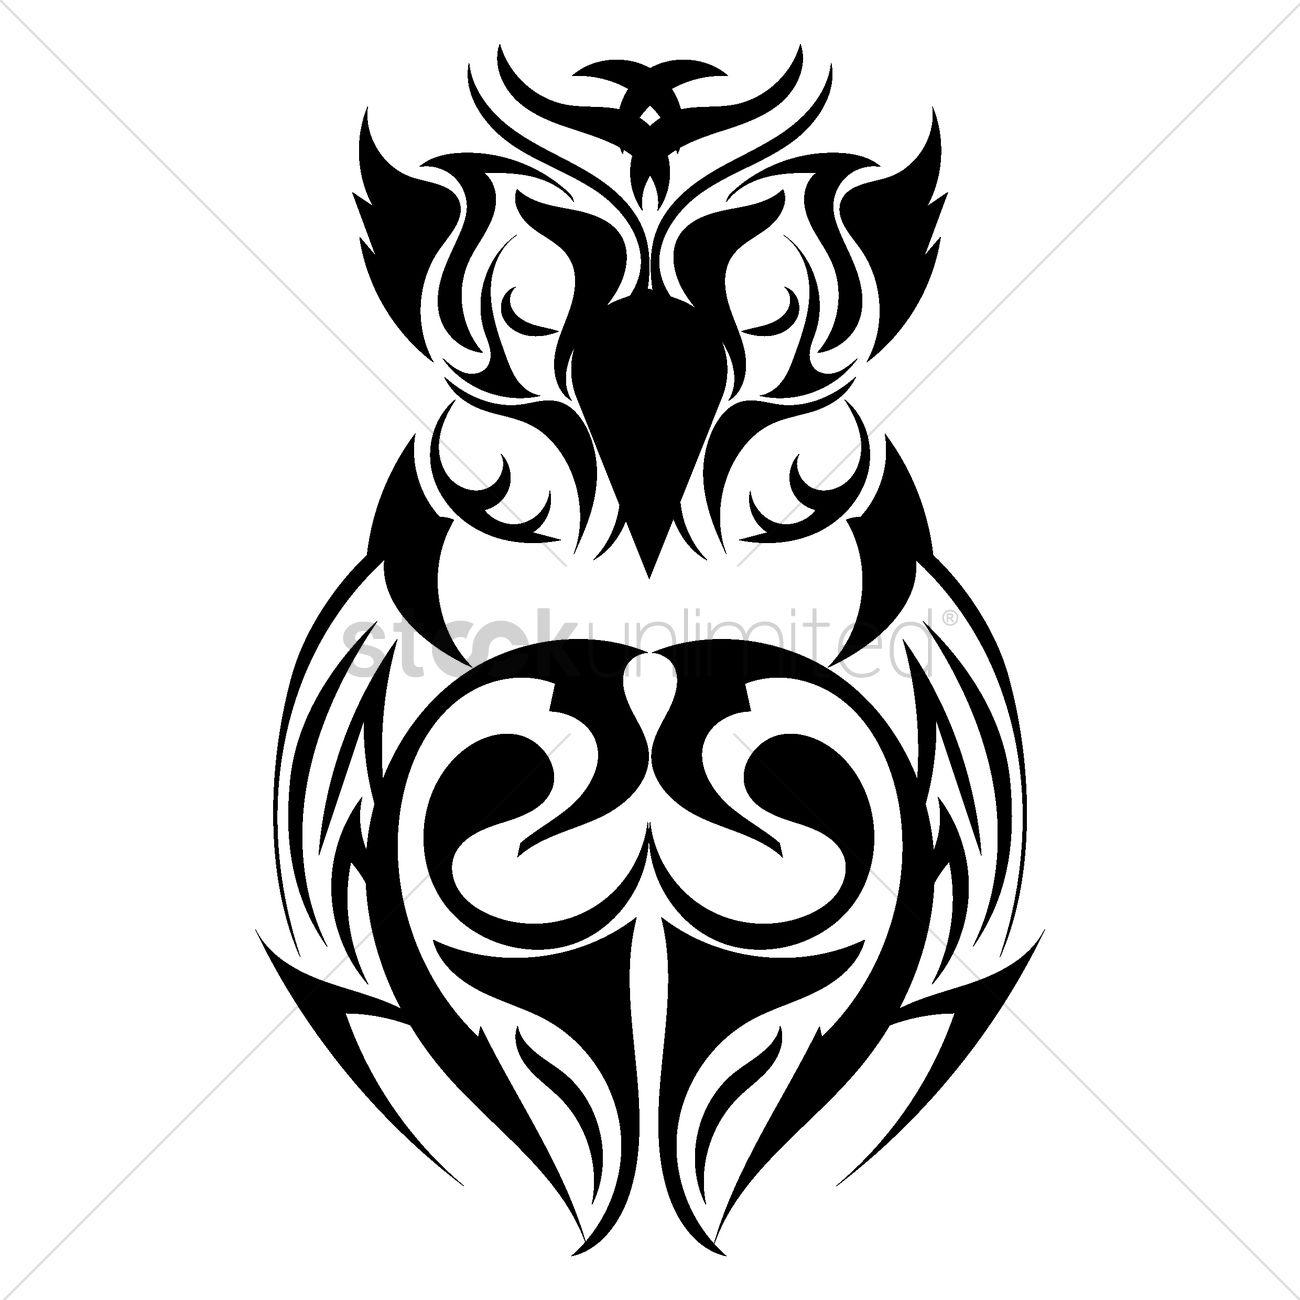 Owl tattoo design Vector Image - 1433392   StockUnlimited